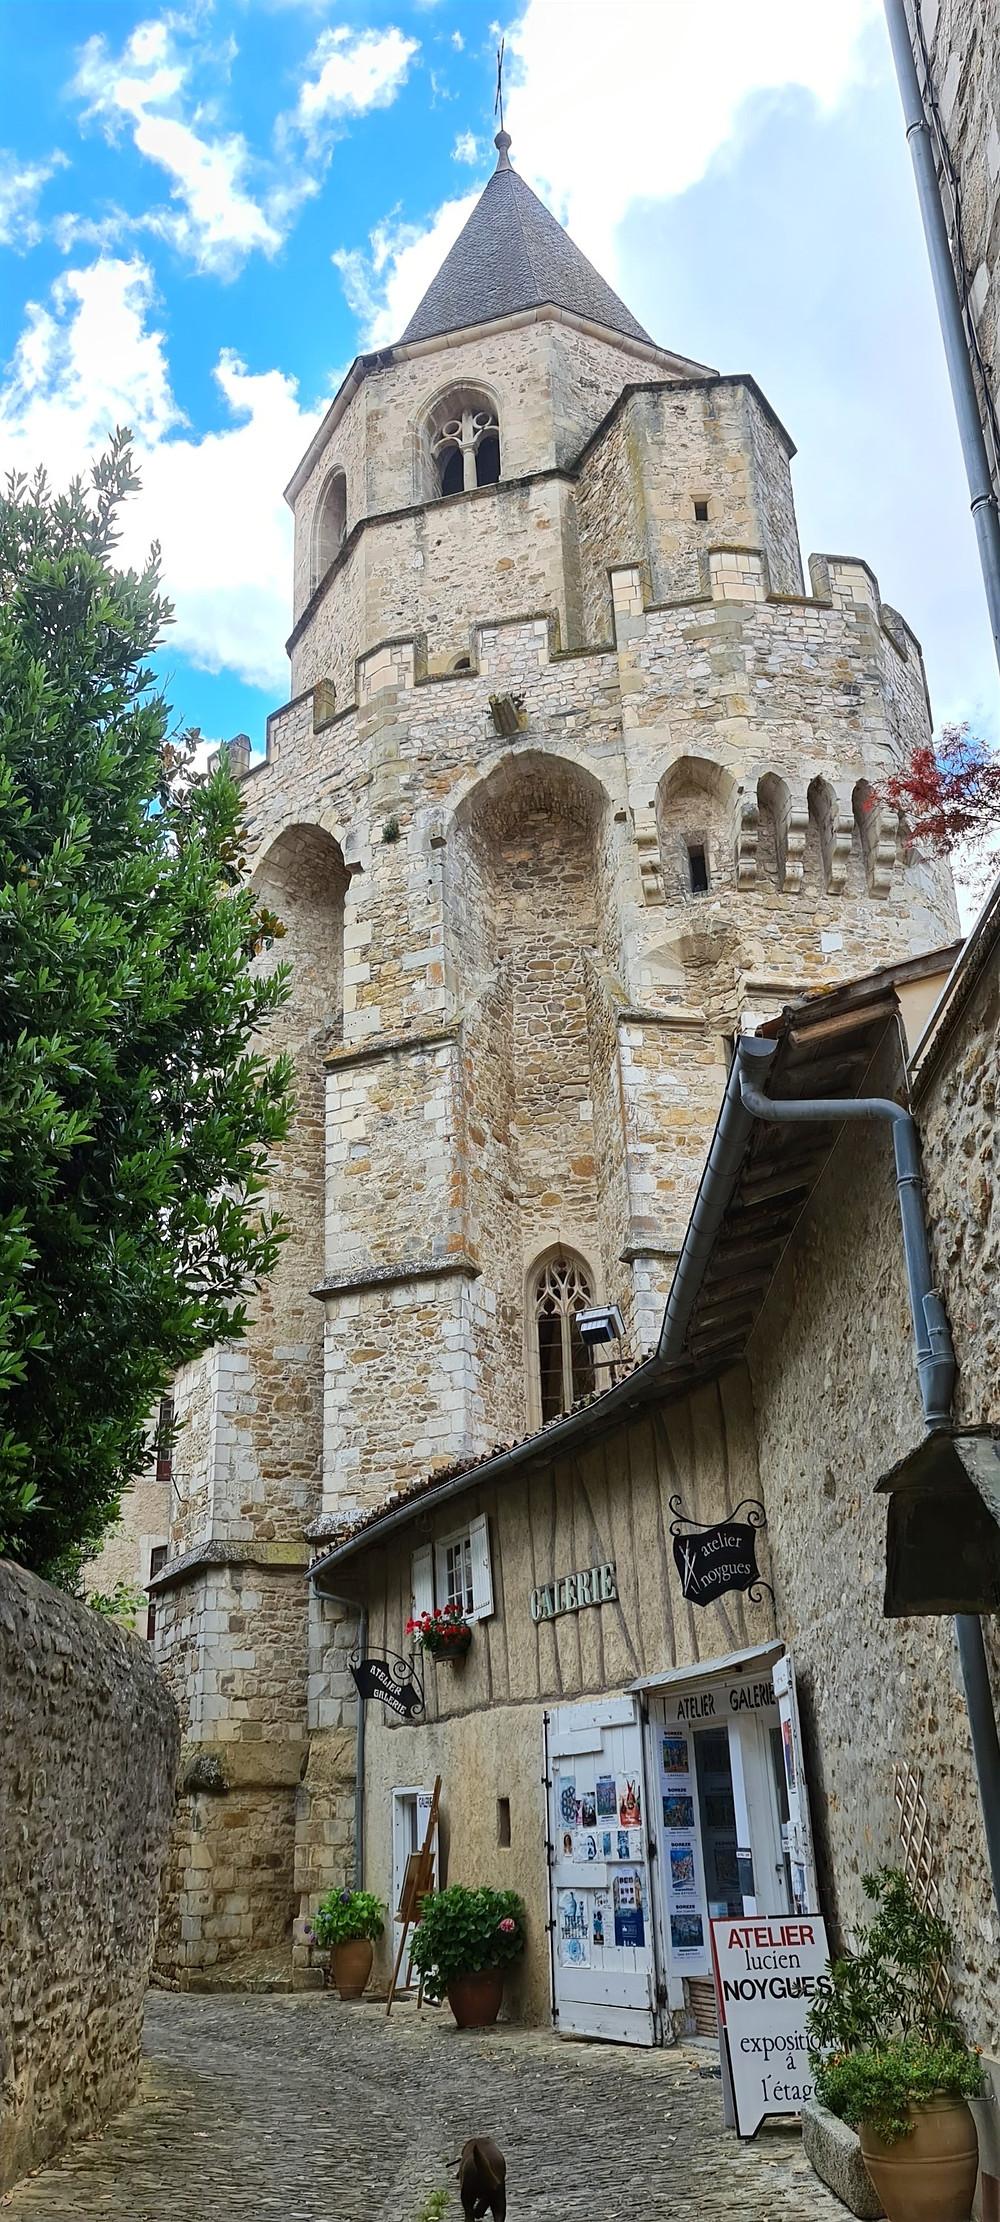 Saint Martin Tower, France, French Town, Church, Protestant Church, Catholic Church